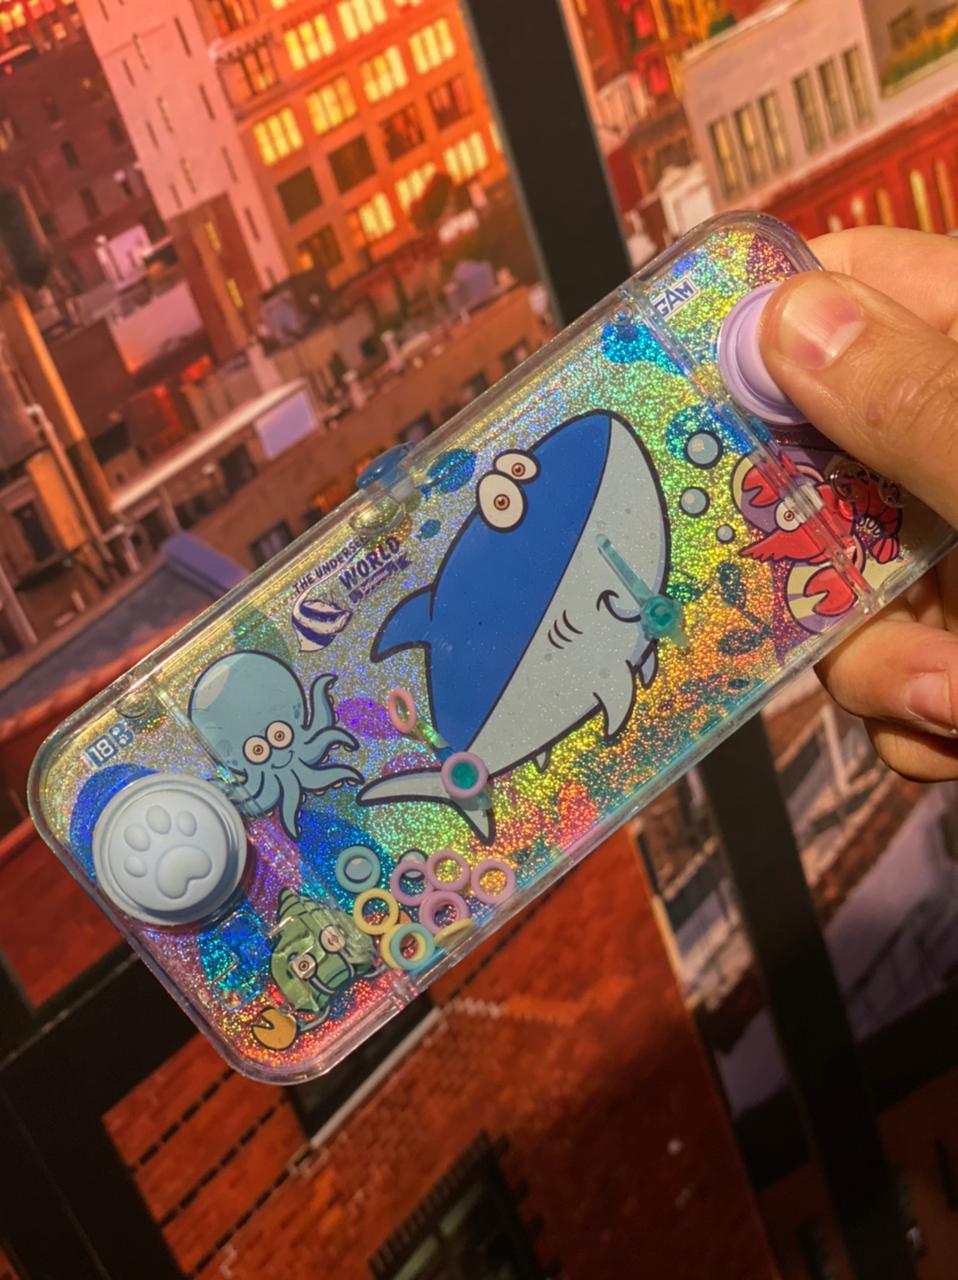 Jogo de Argolas Mini Game de Água Aquaplay Tubarão Anti Estresse Pop It Fidget Bubble Stress Ball Wacky Track SquishMallow Sensorial de Alívio de Stress  - EV